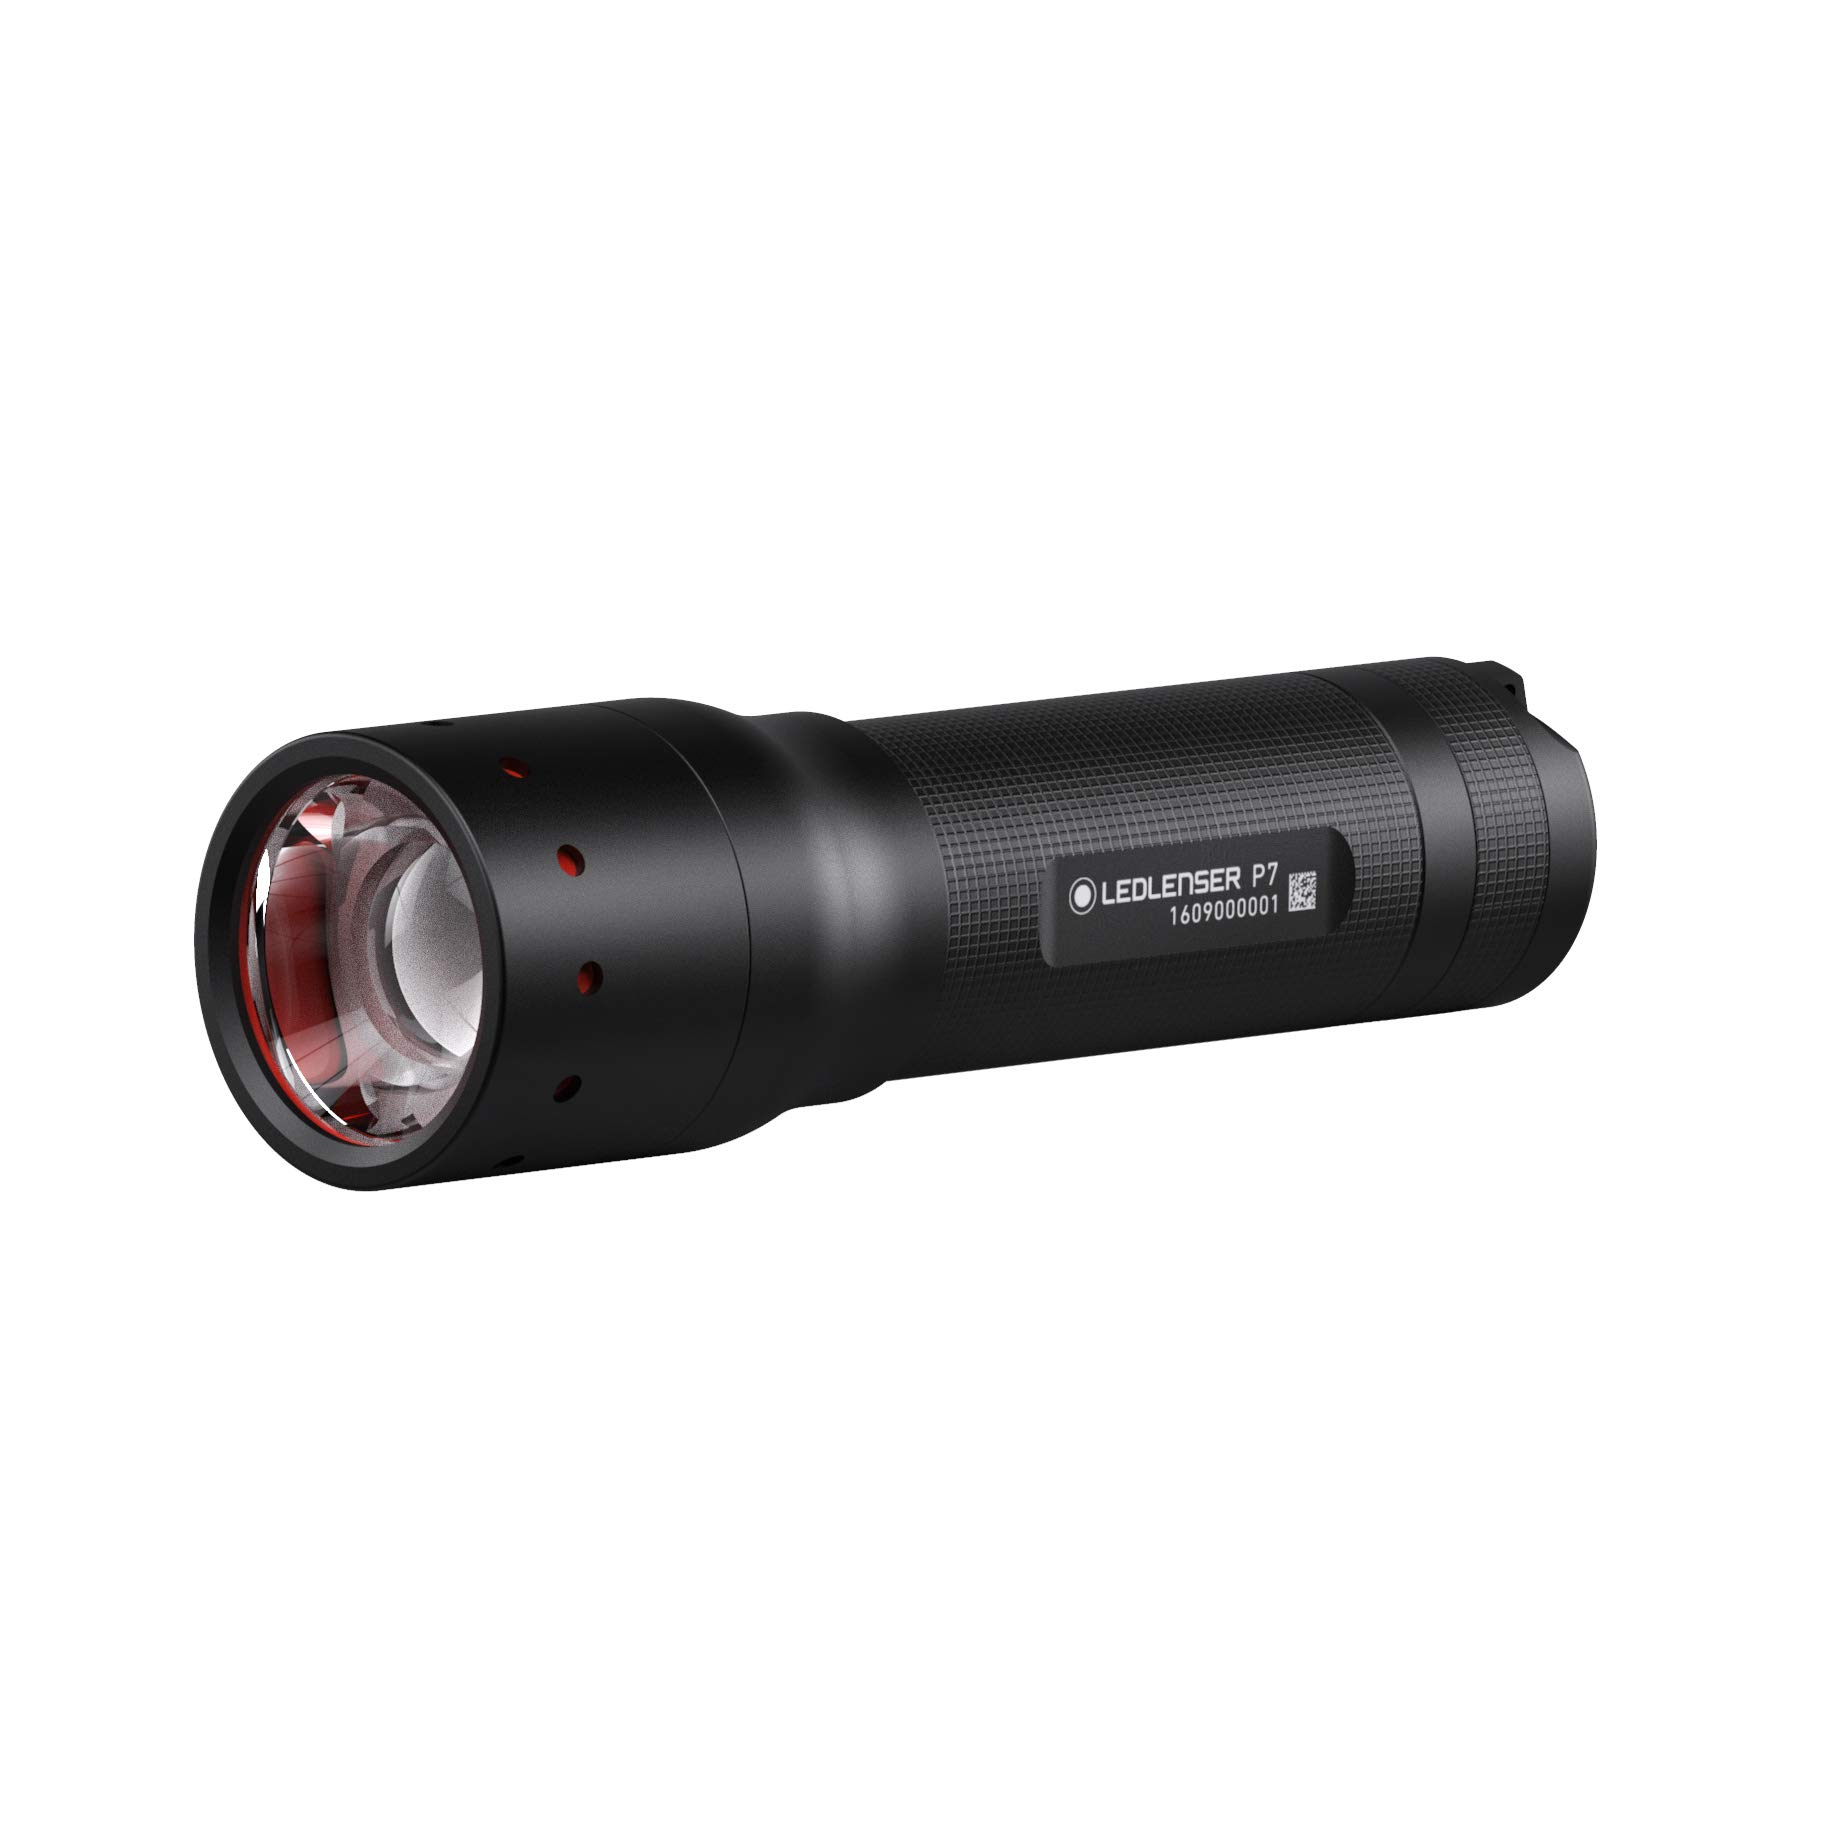 Ledlenser, P7 Flashlight with Advanced Focus System